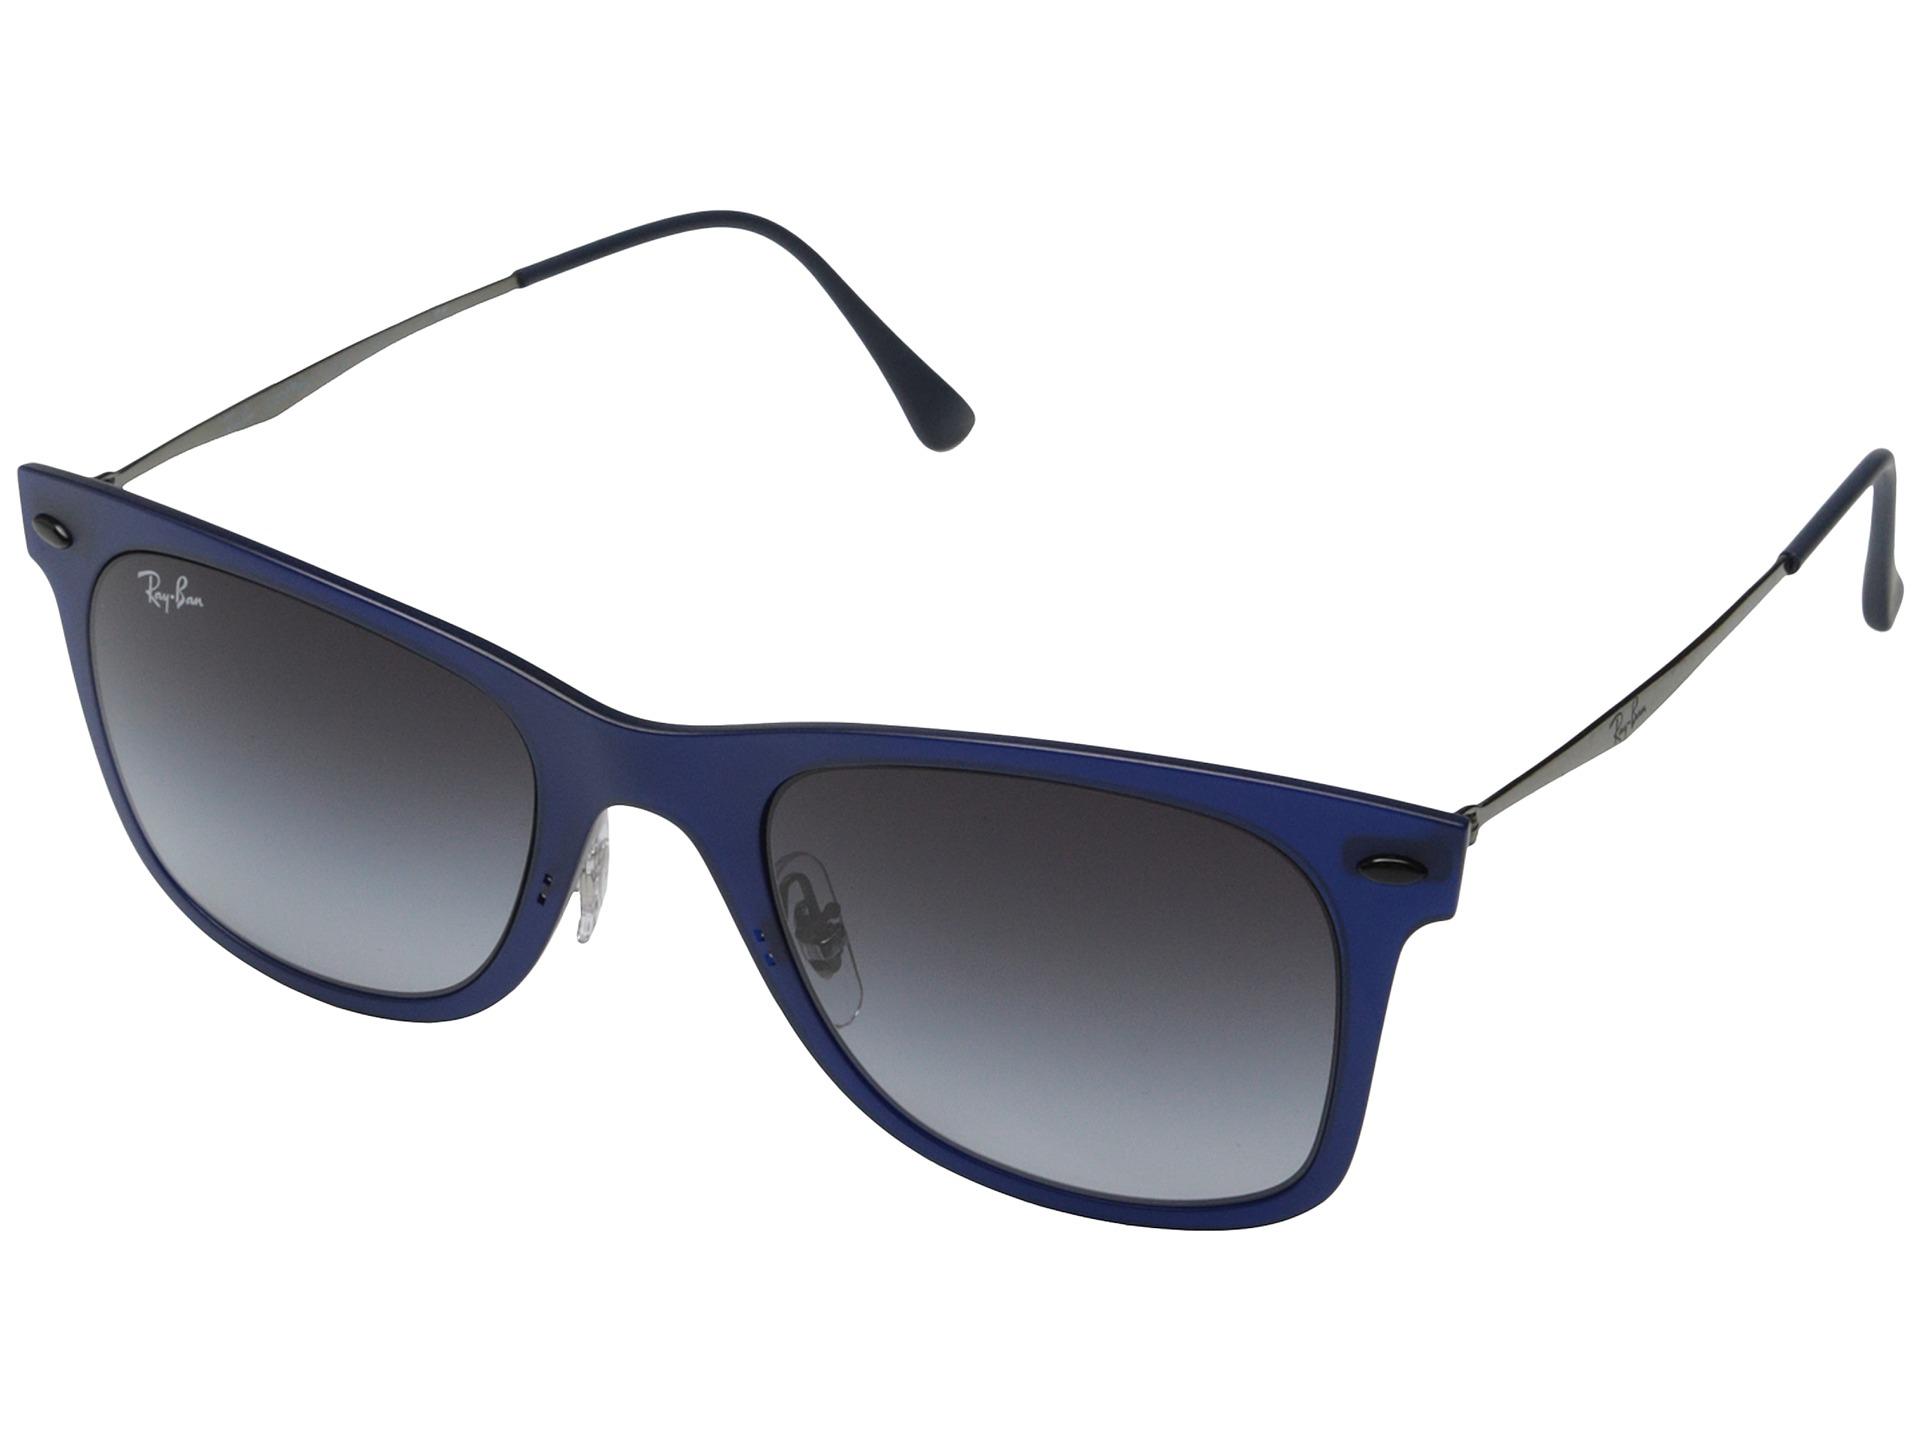 buy oakley prescription glasses online 0zrt  buy oakley prescription glasses online